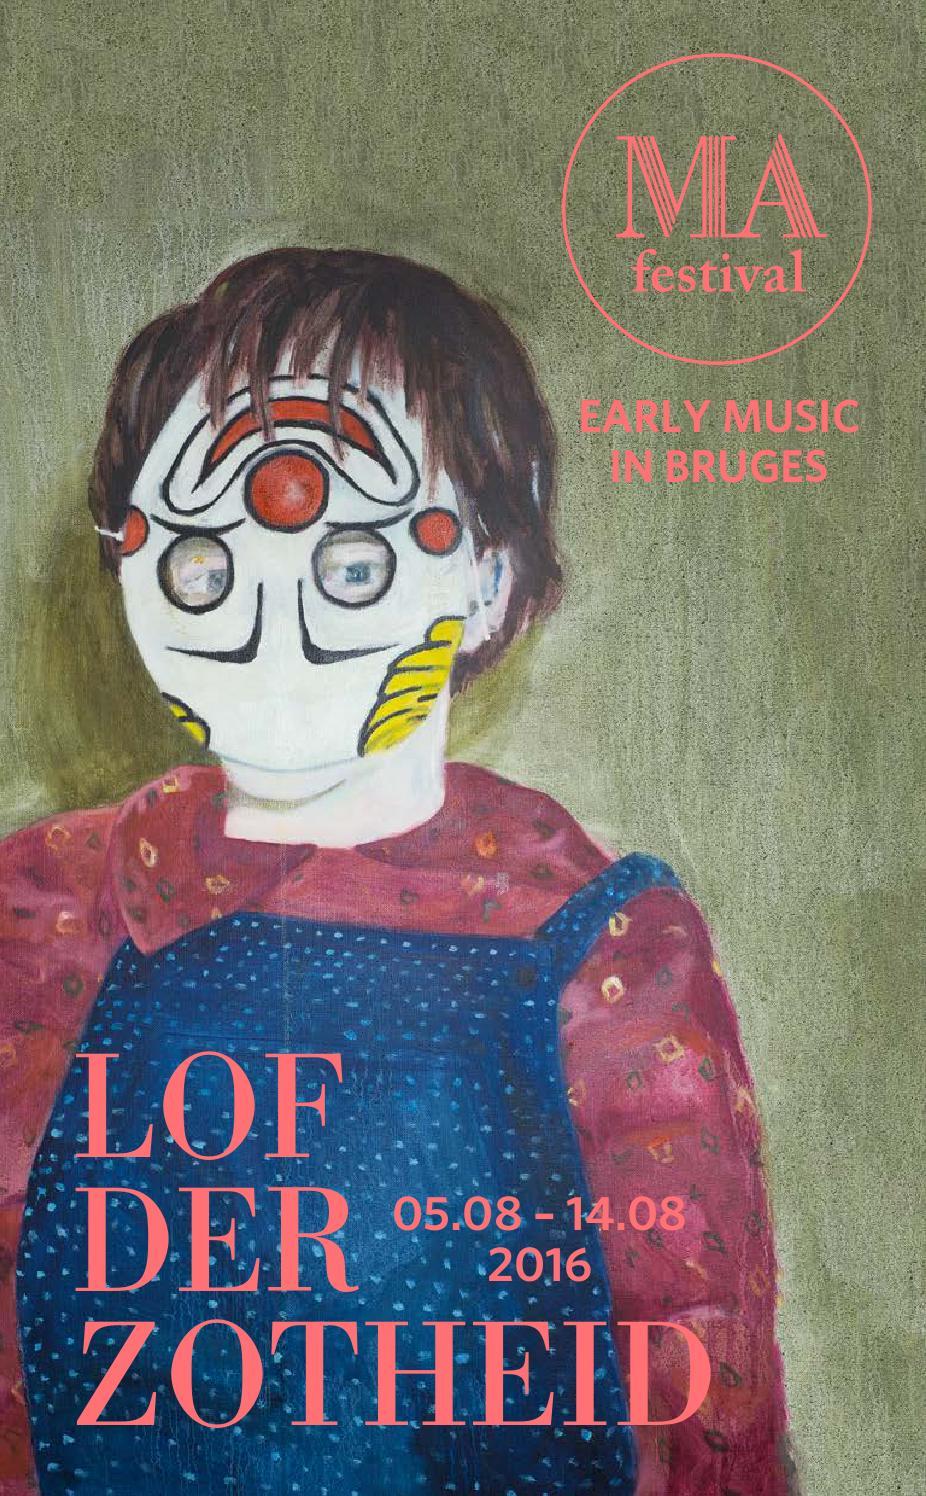 Citaten Uit Lof Der Zotheid : Brochure mafestival lof der zotheid by